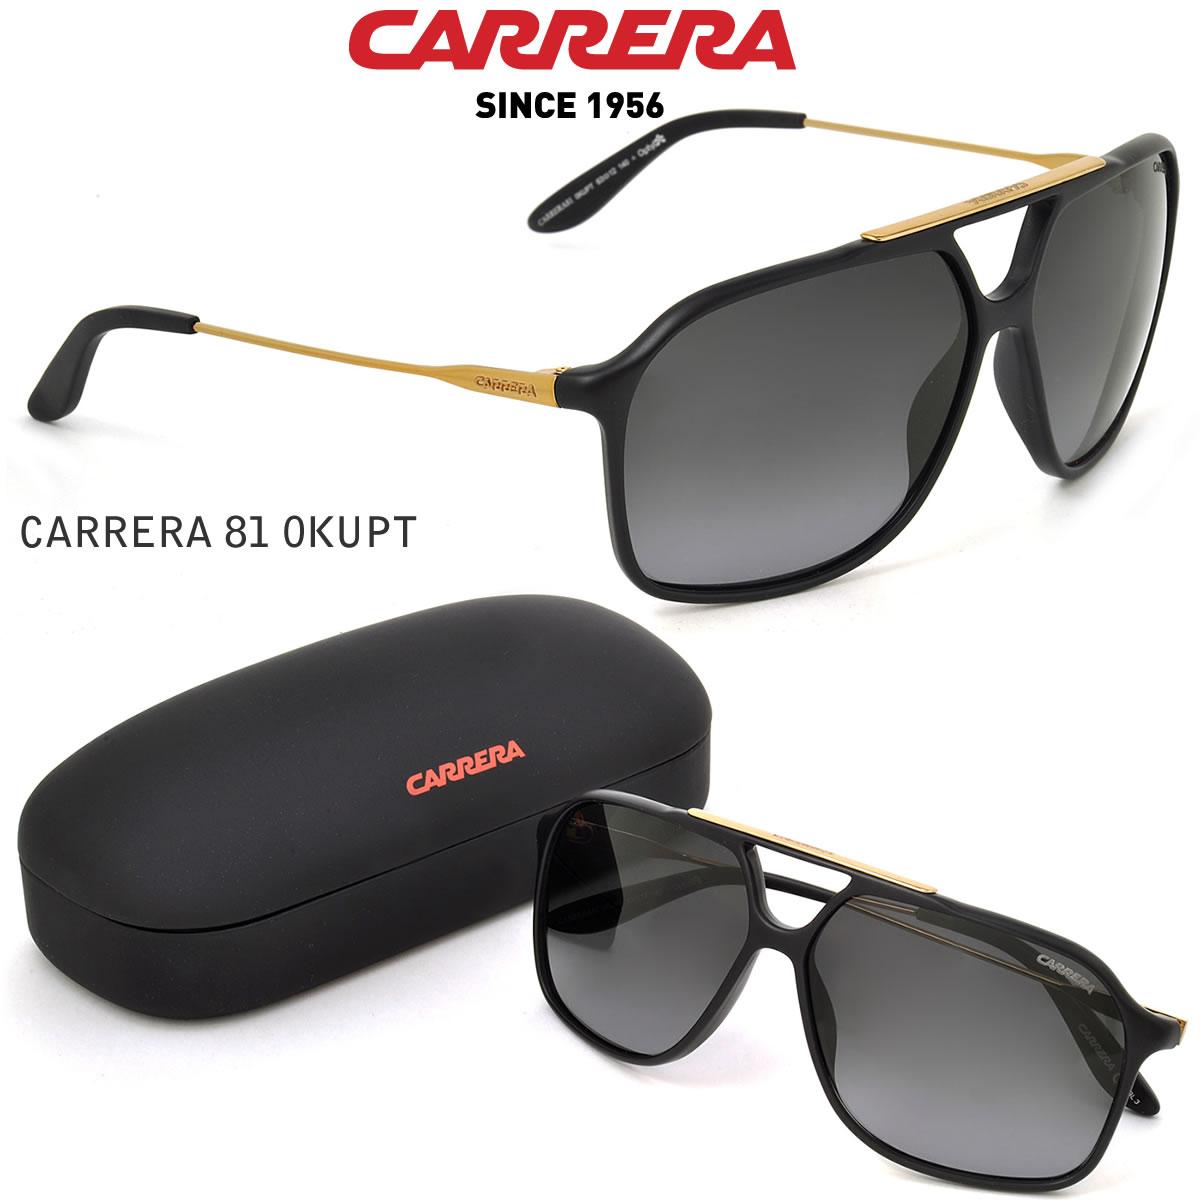 CARRERA 81 0KUPT